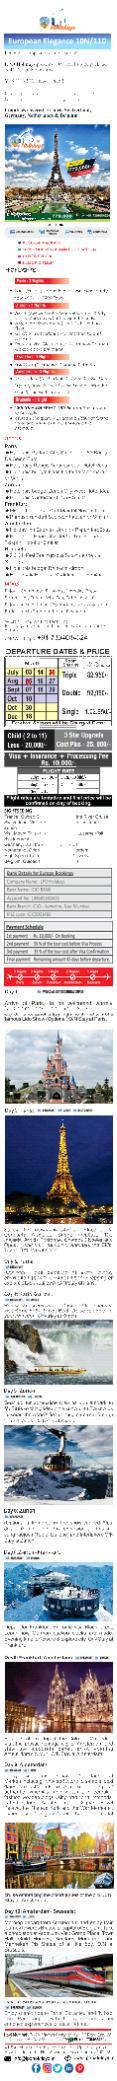 Paris Tour Package At LPO Holidays PowerPoint PPT Presentation